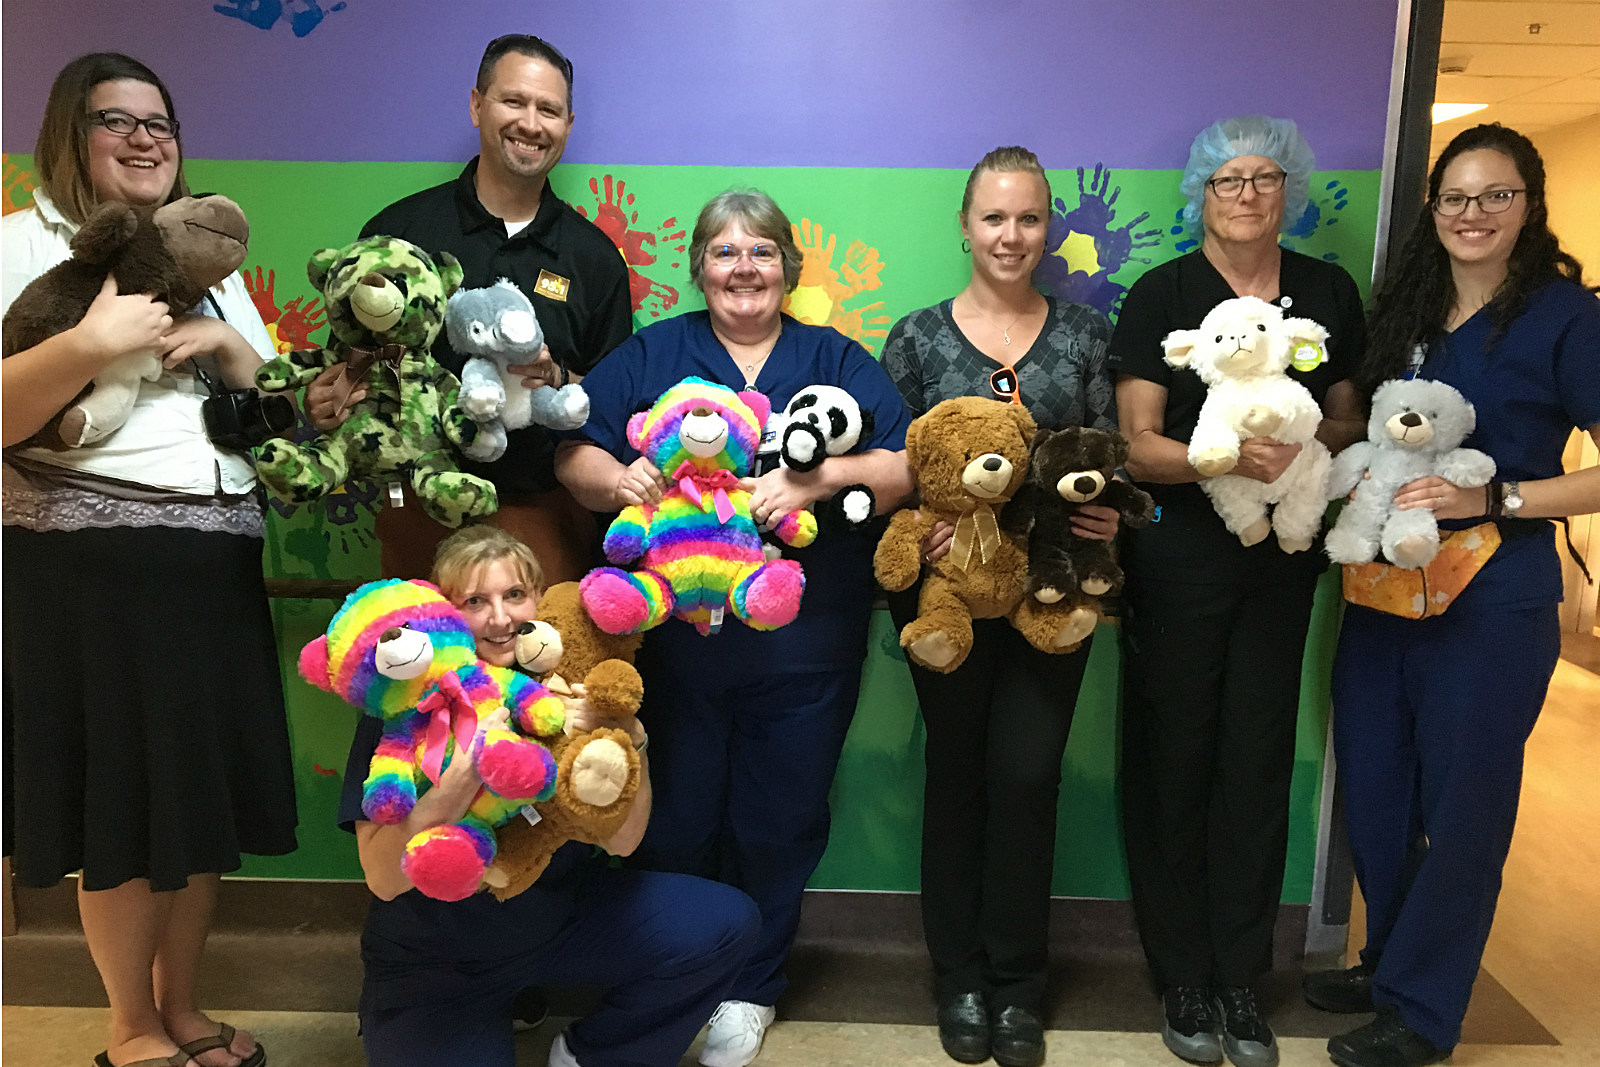 Teddy Bears, Stuffed Animals, IMH, Donation, 2017